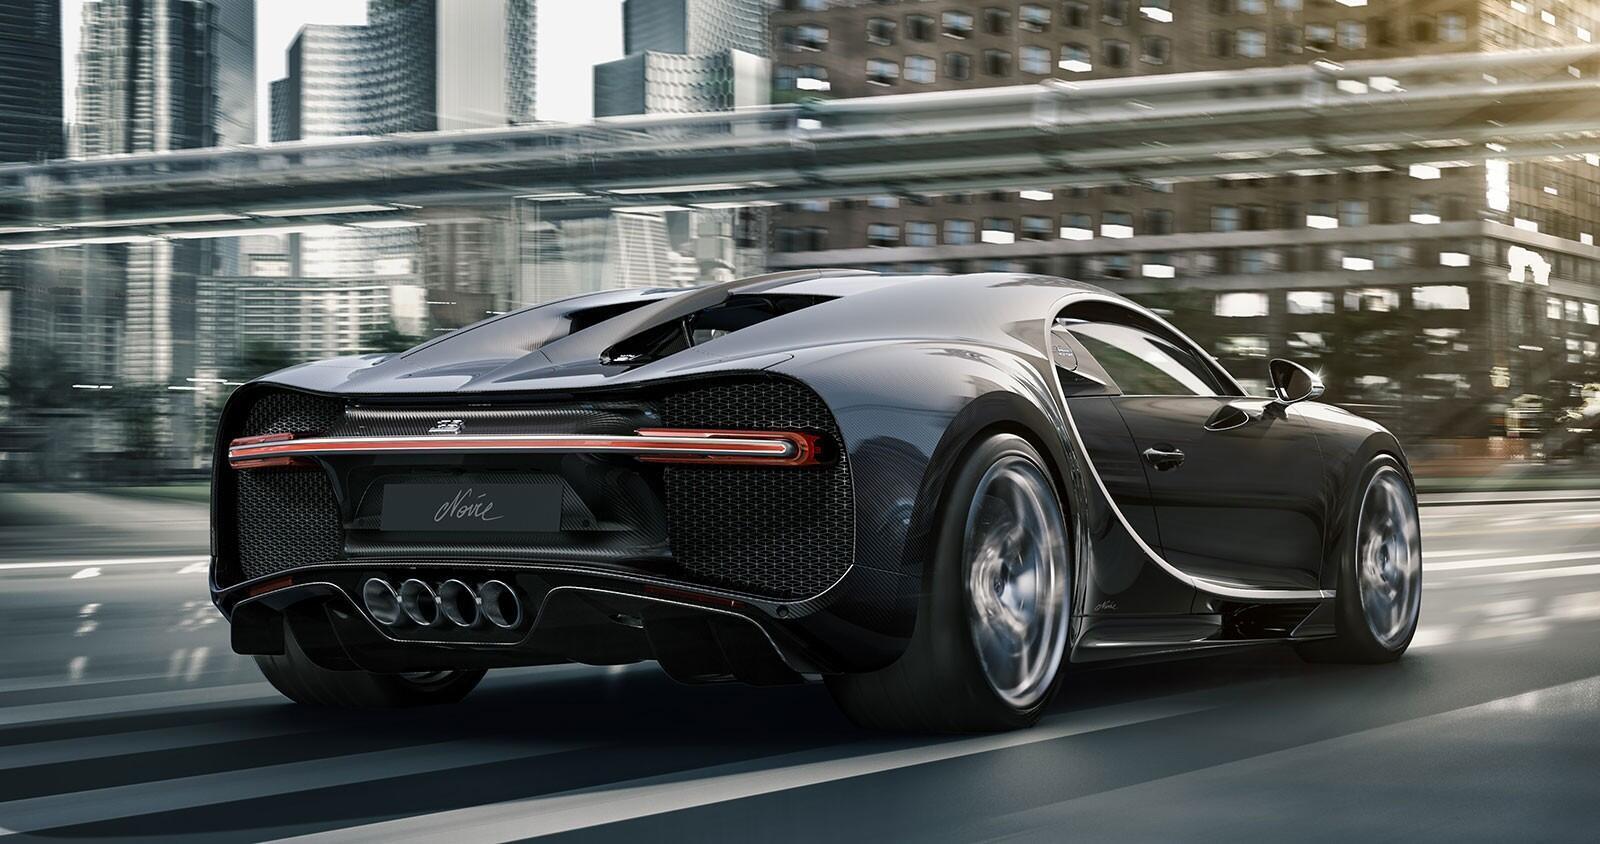 sau-la-voiture-noire-gia-437-ty-dong-bugatti-chiron-co-them-phien-ban-dac-biet-moi-mang-ten-noire-1.jpg